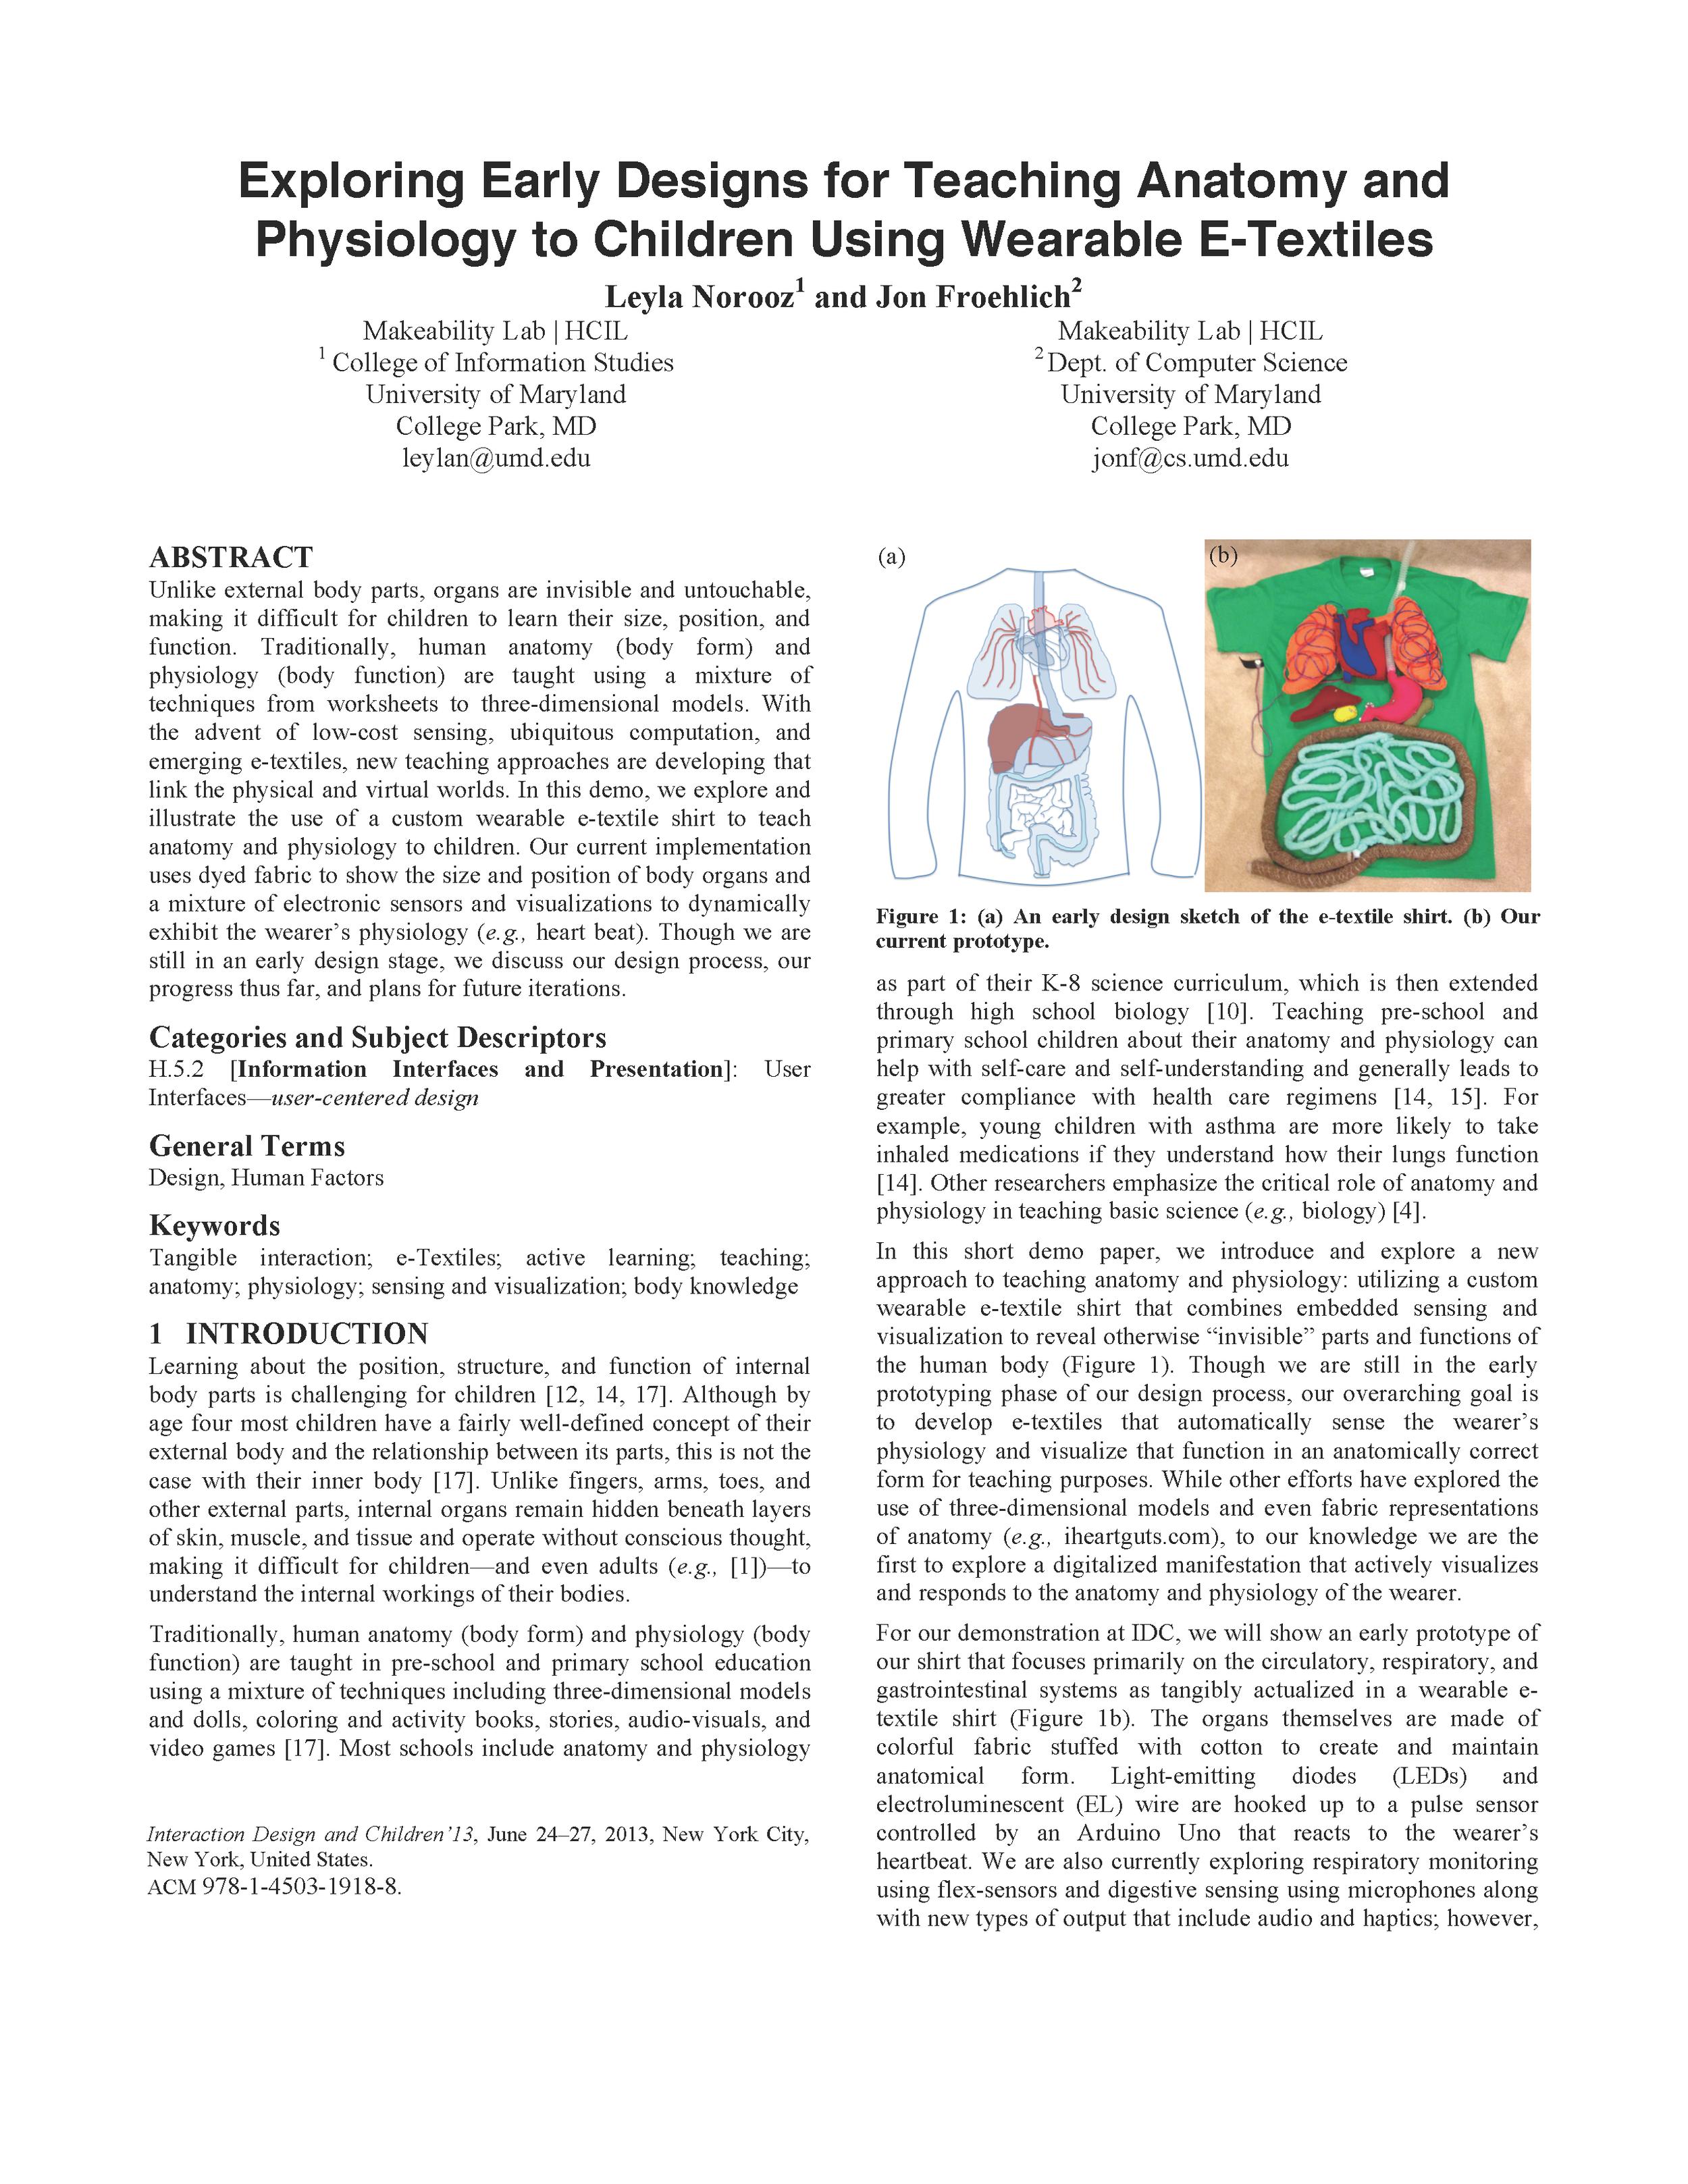 IDC2013_AnatomicalShirtDemo_CR_v3_Page_1.png